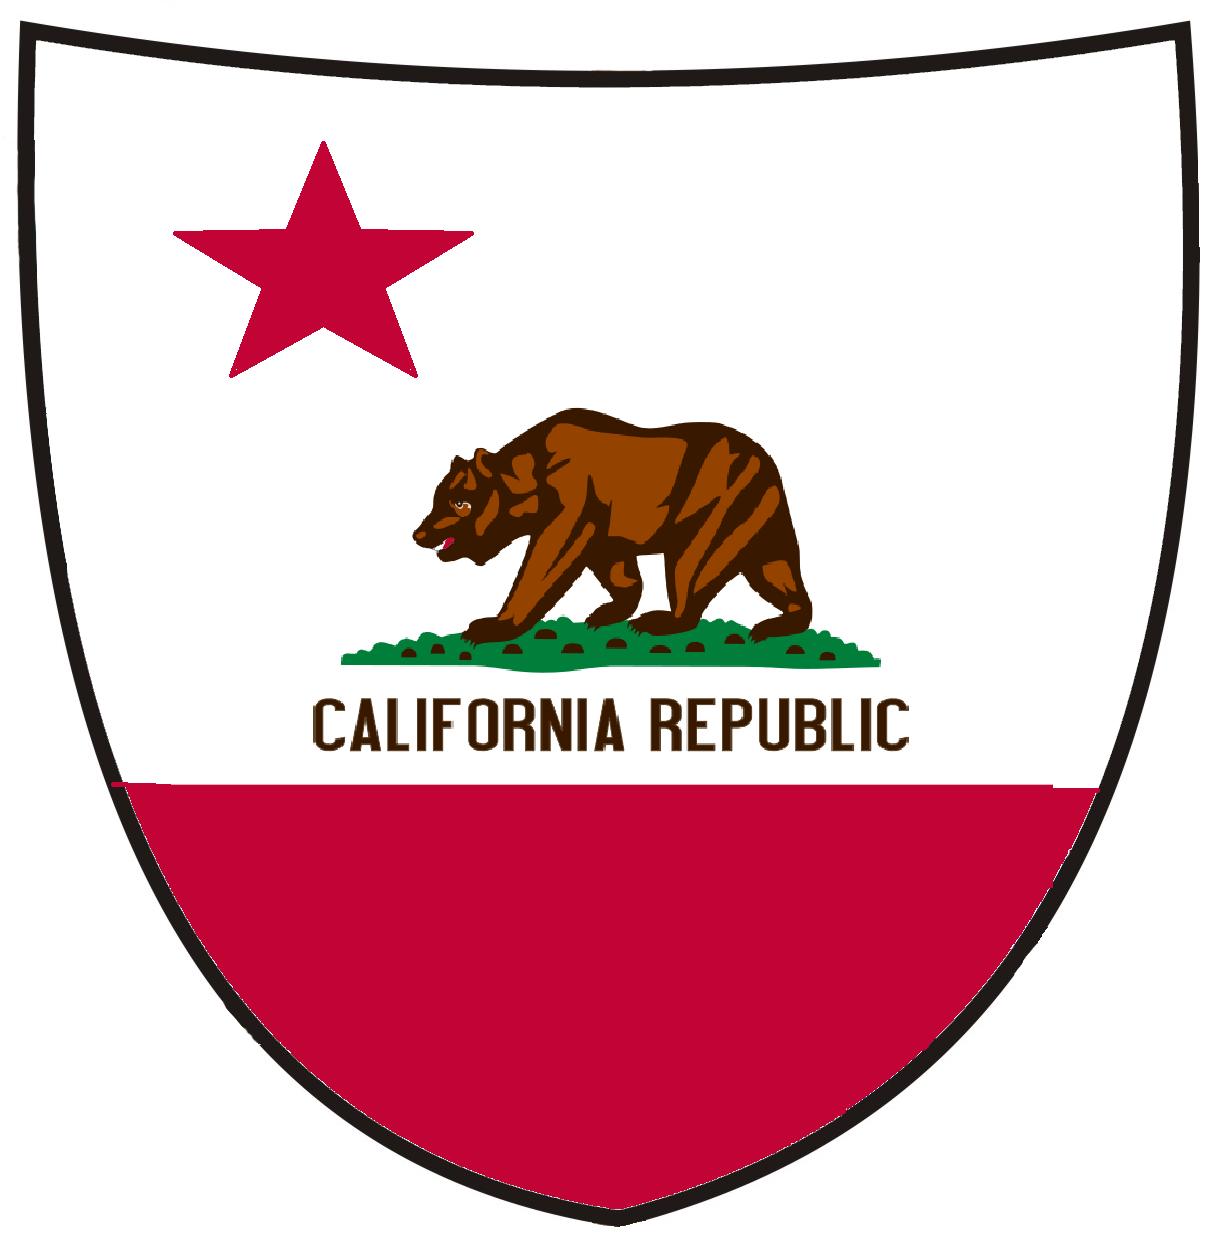 Lista de jefes de estado de California (ASXX)